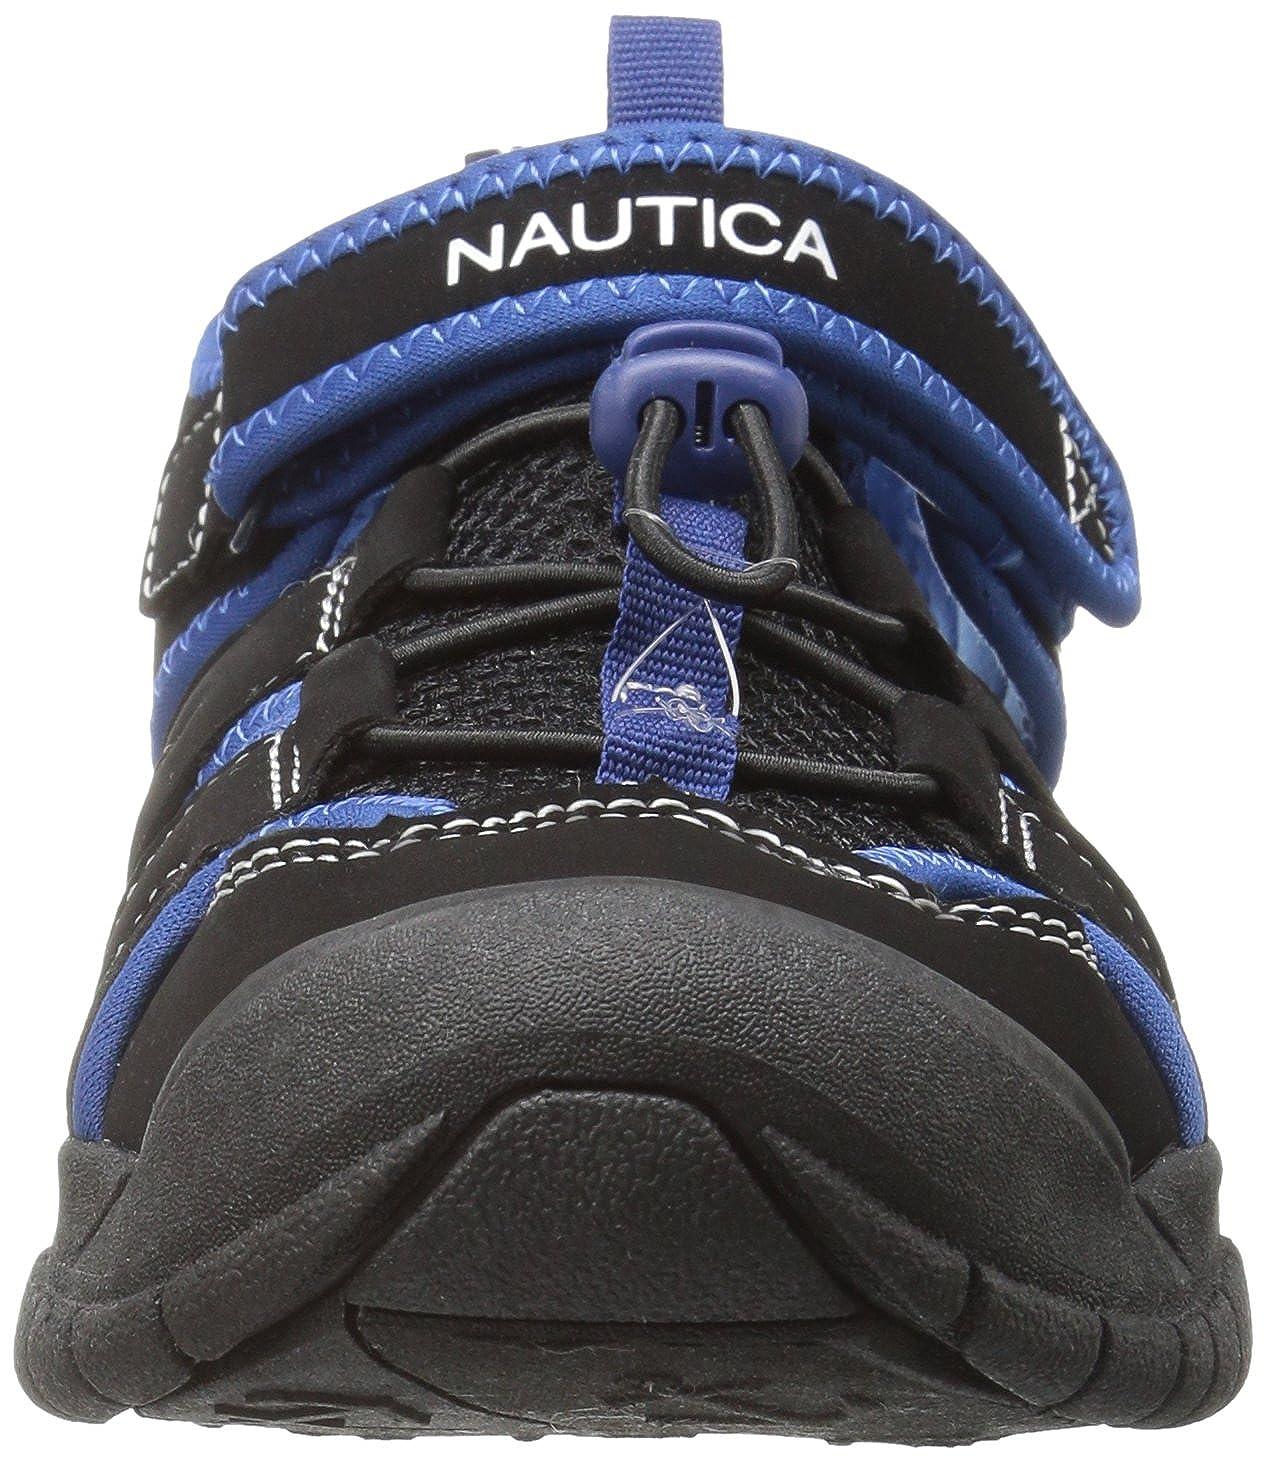 K Nautica Kids Wallport Slip-on Wallport